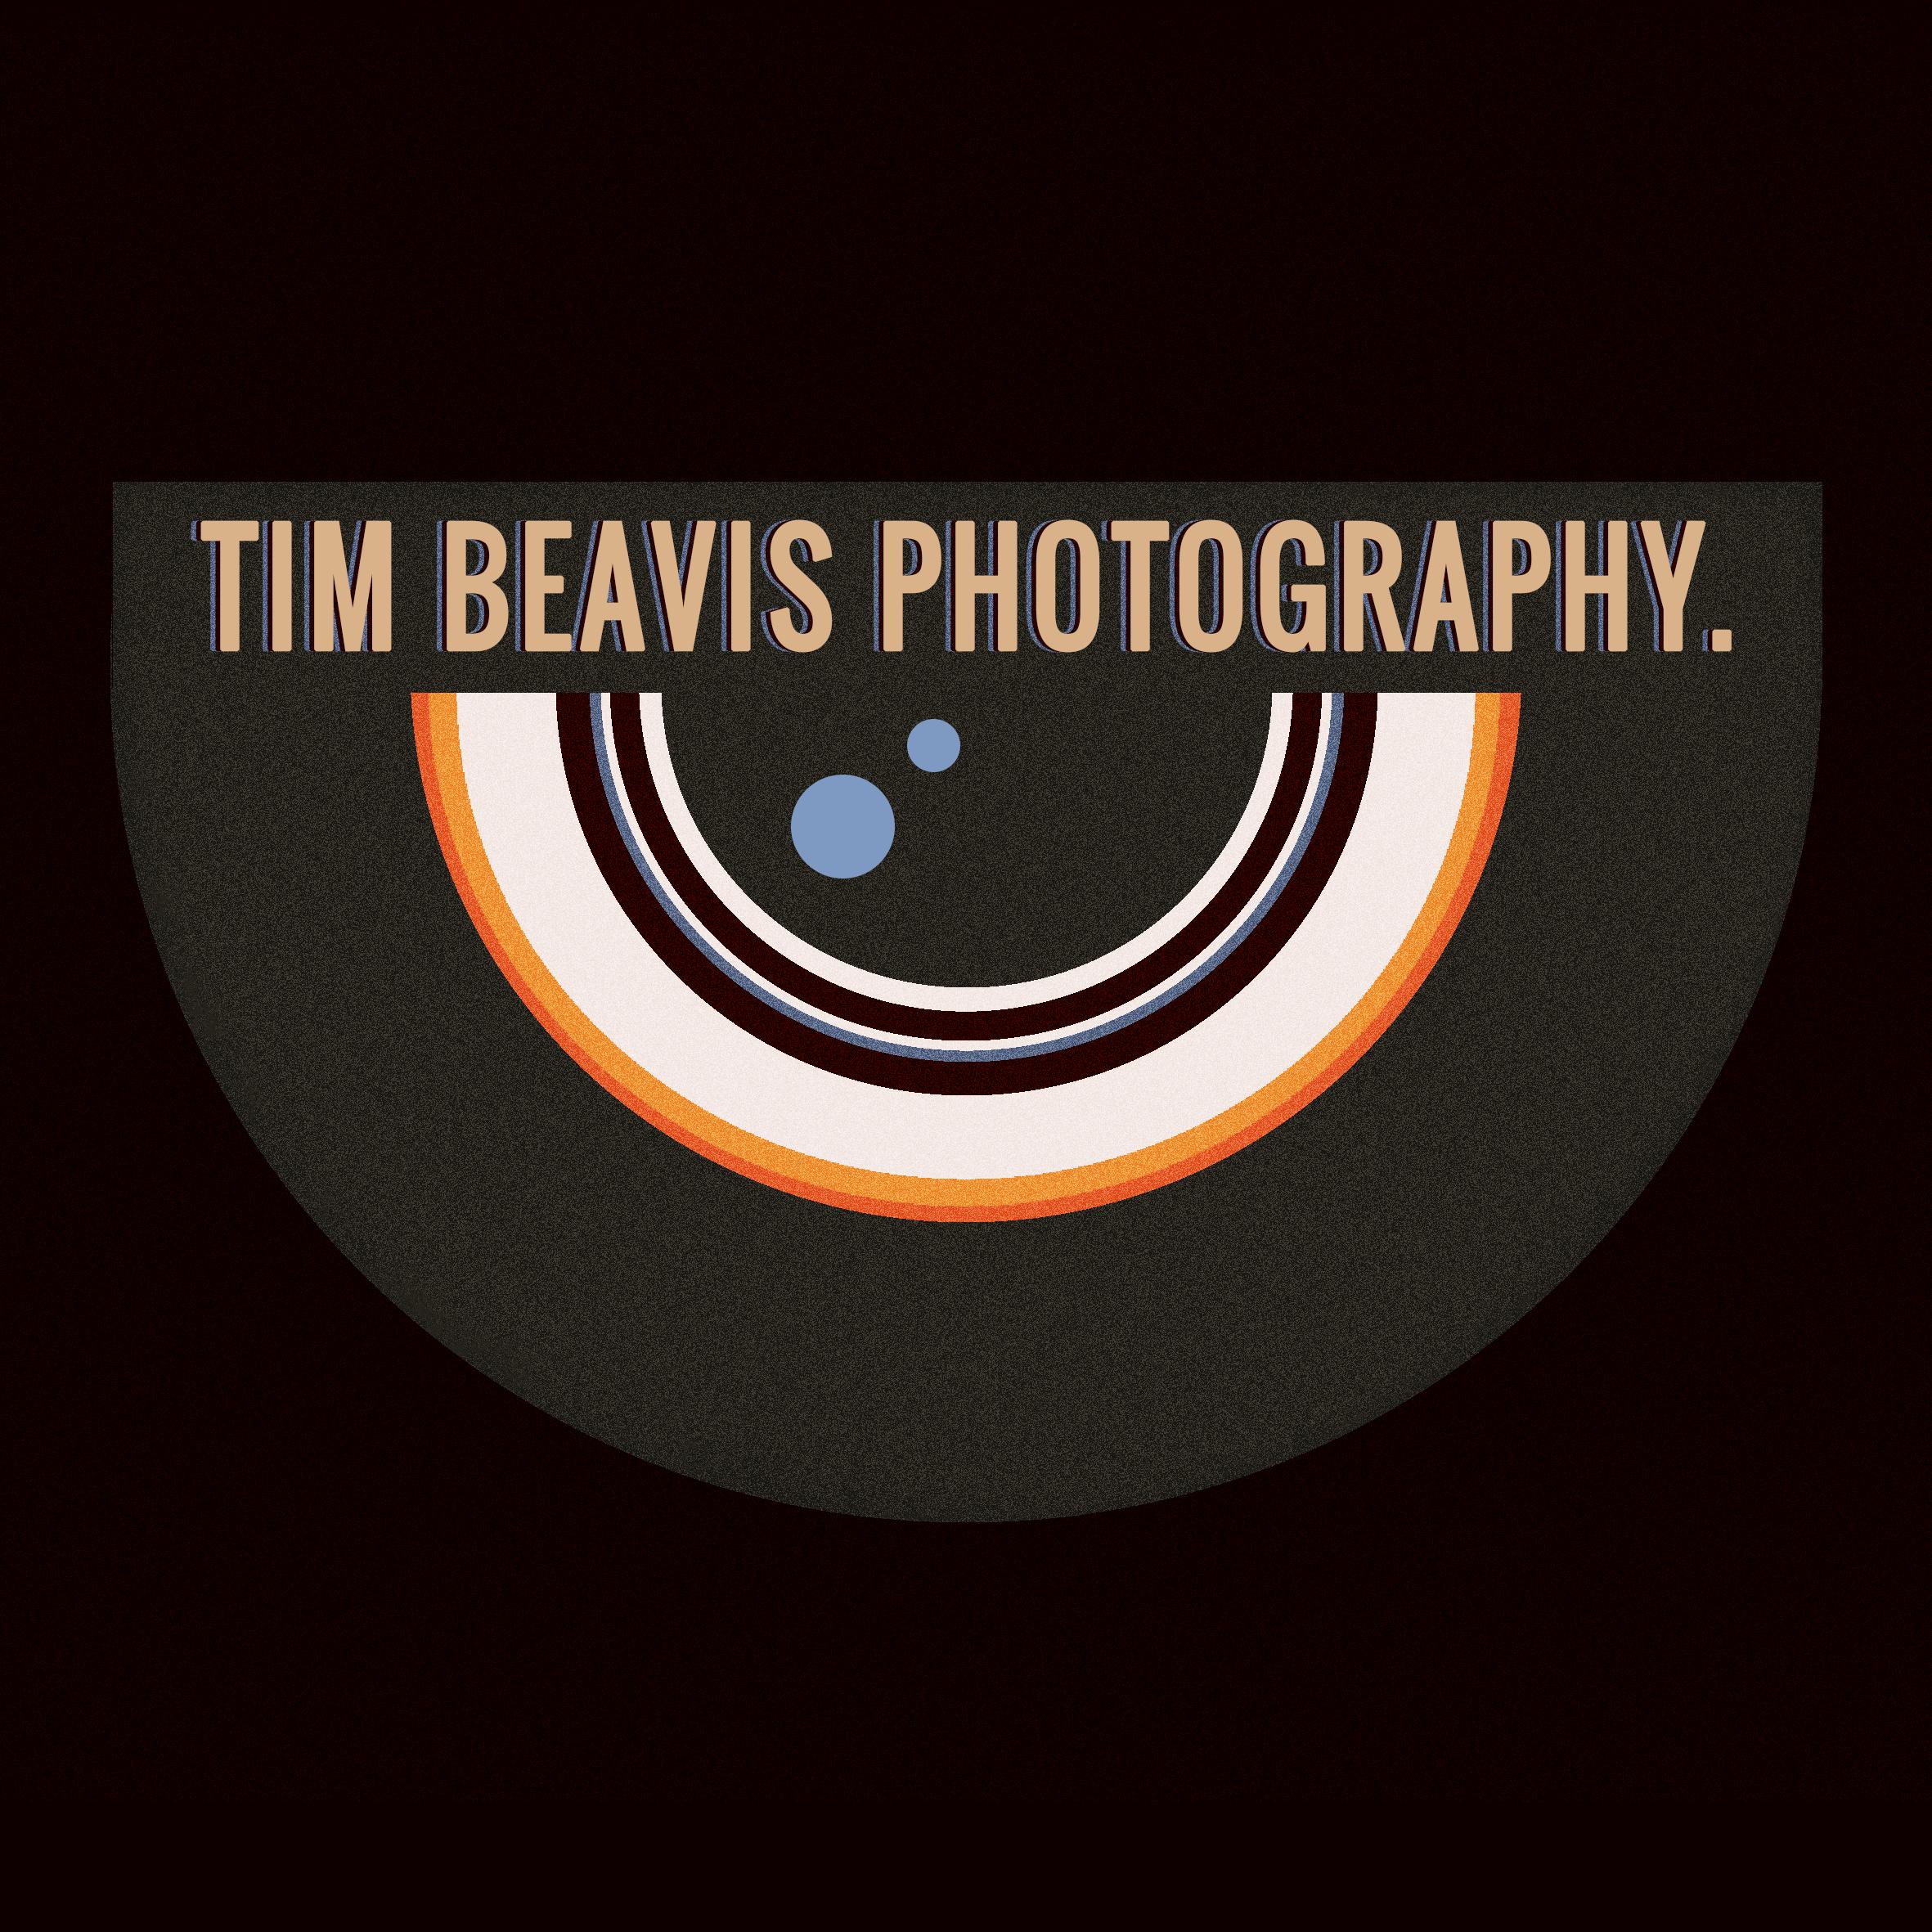 Tim Beavis